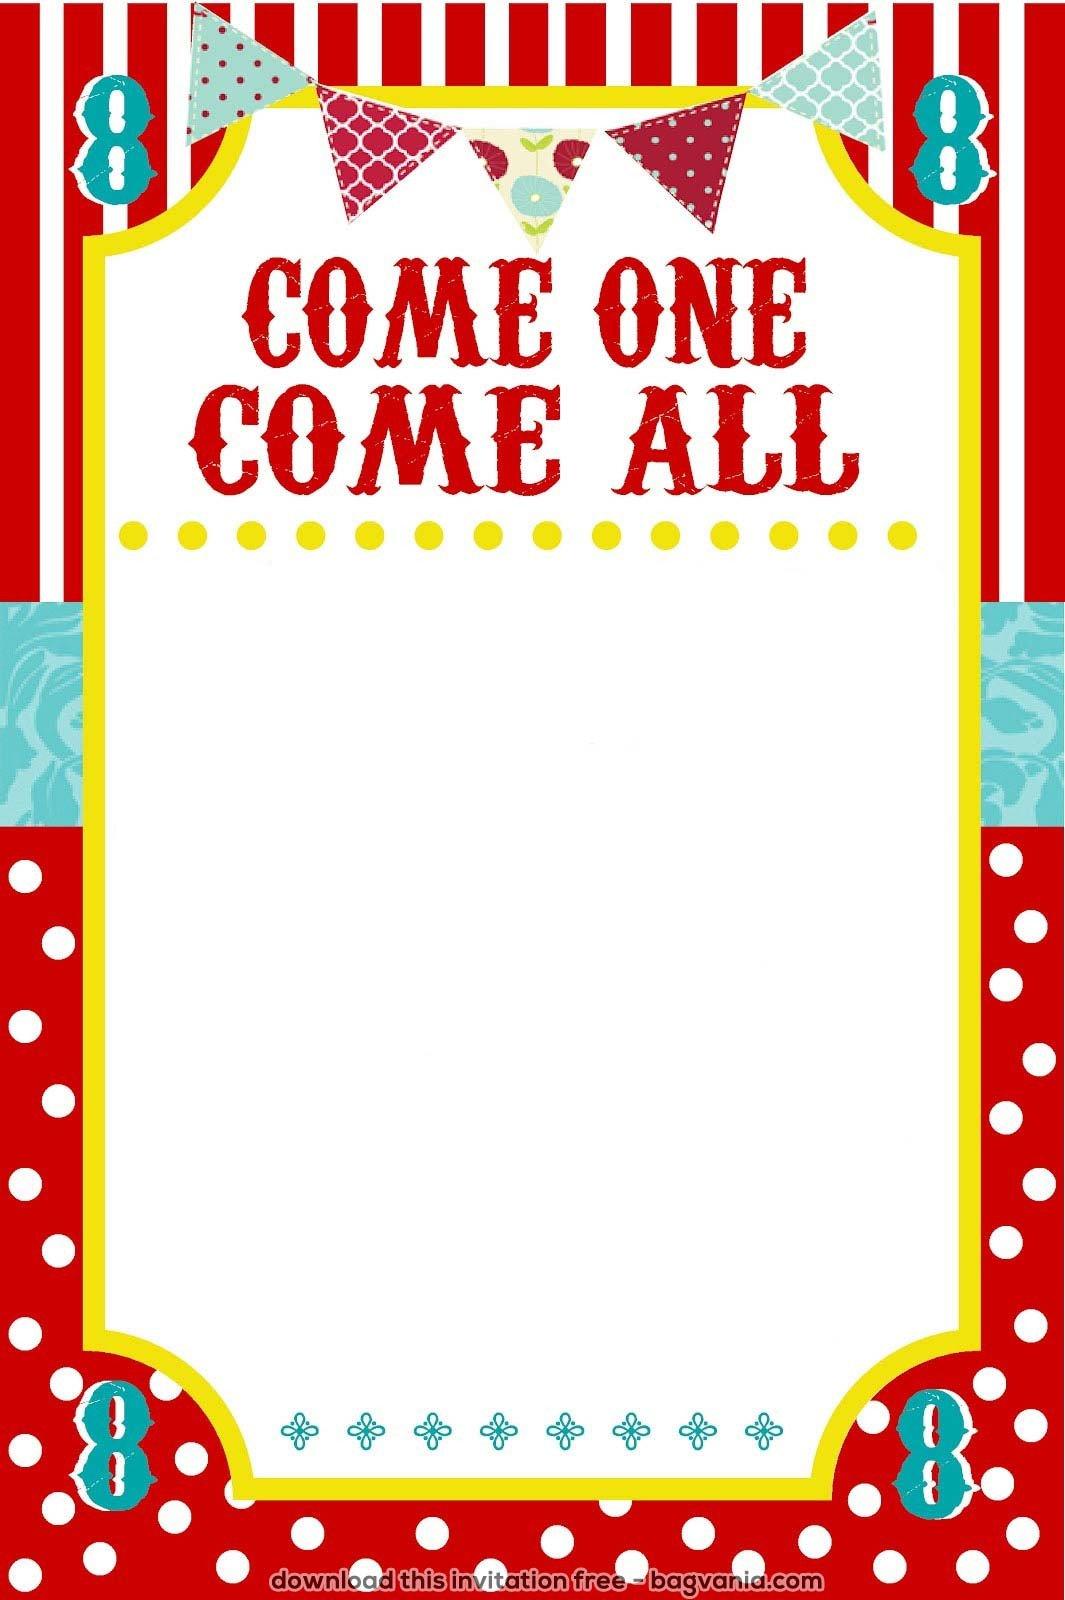 Carnival Invitation Template Free Free Carnival Birthday Invitations – Free Printable